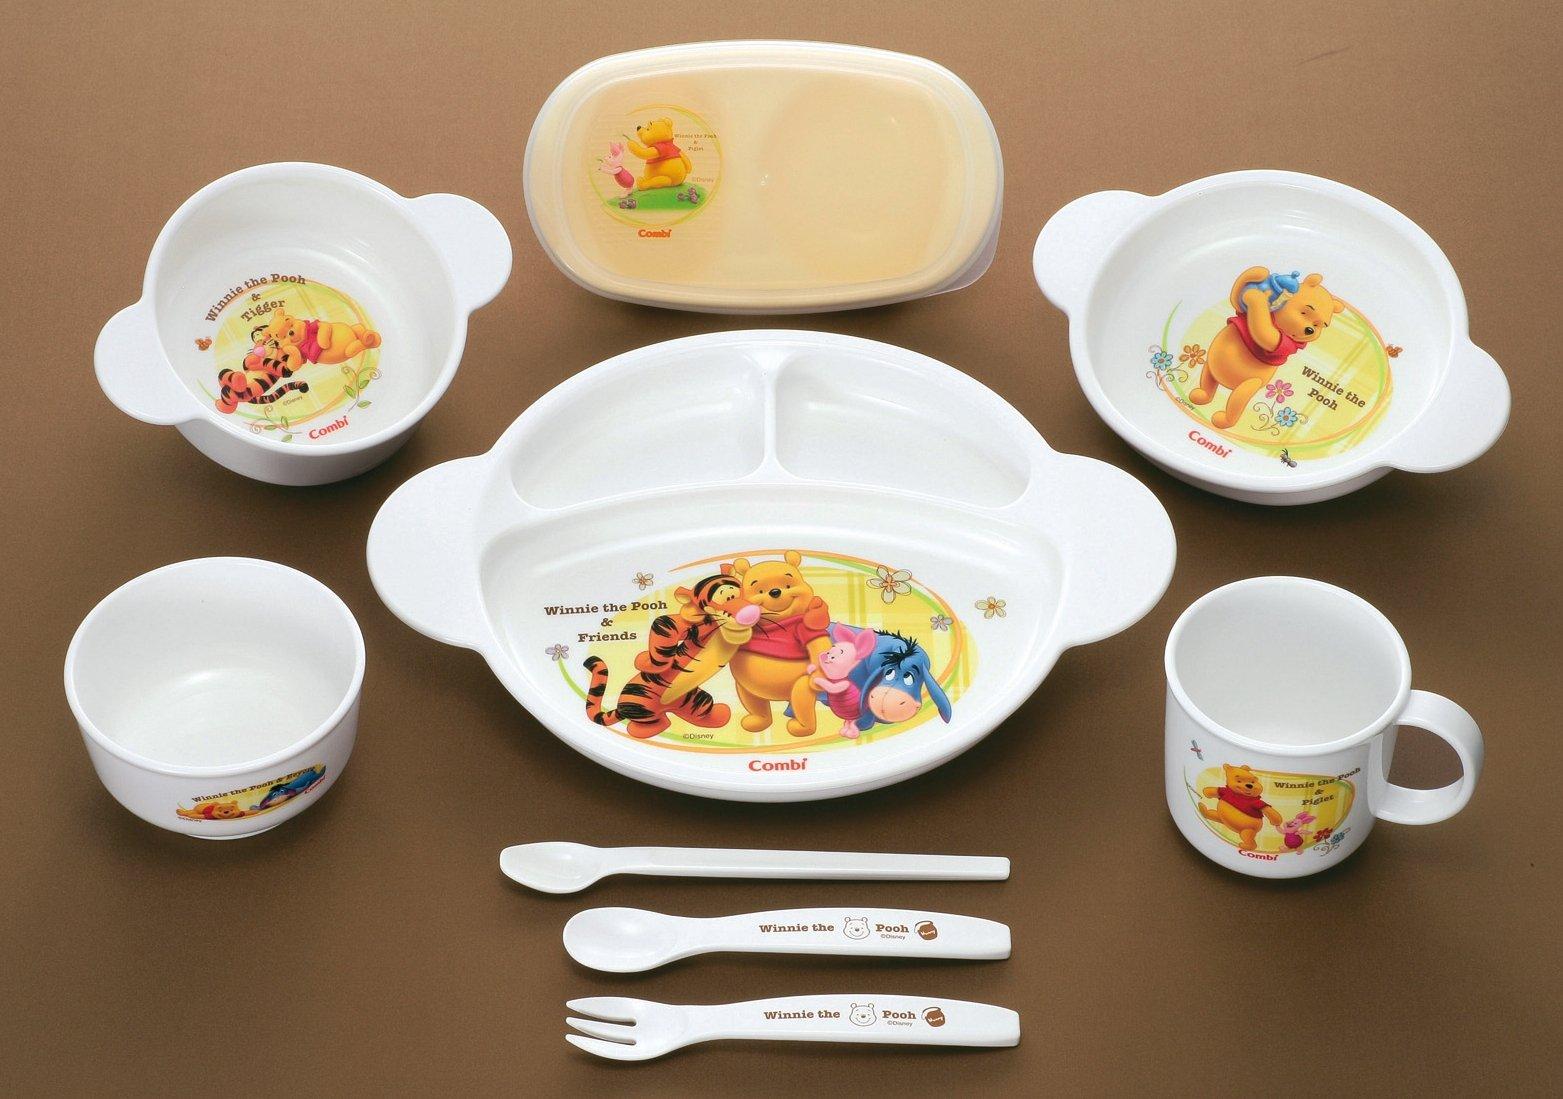 Combi Winnie the Pooh Baby Food Dish set Feeding dish box set